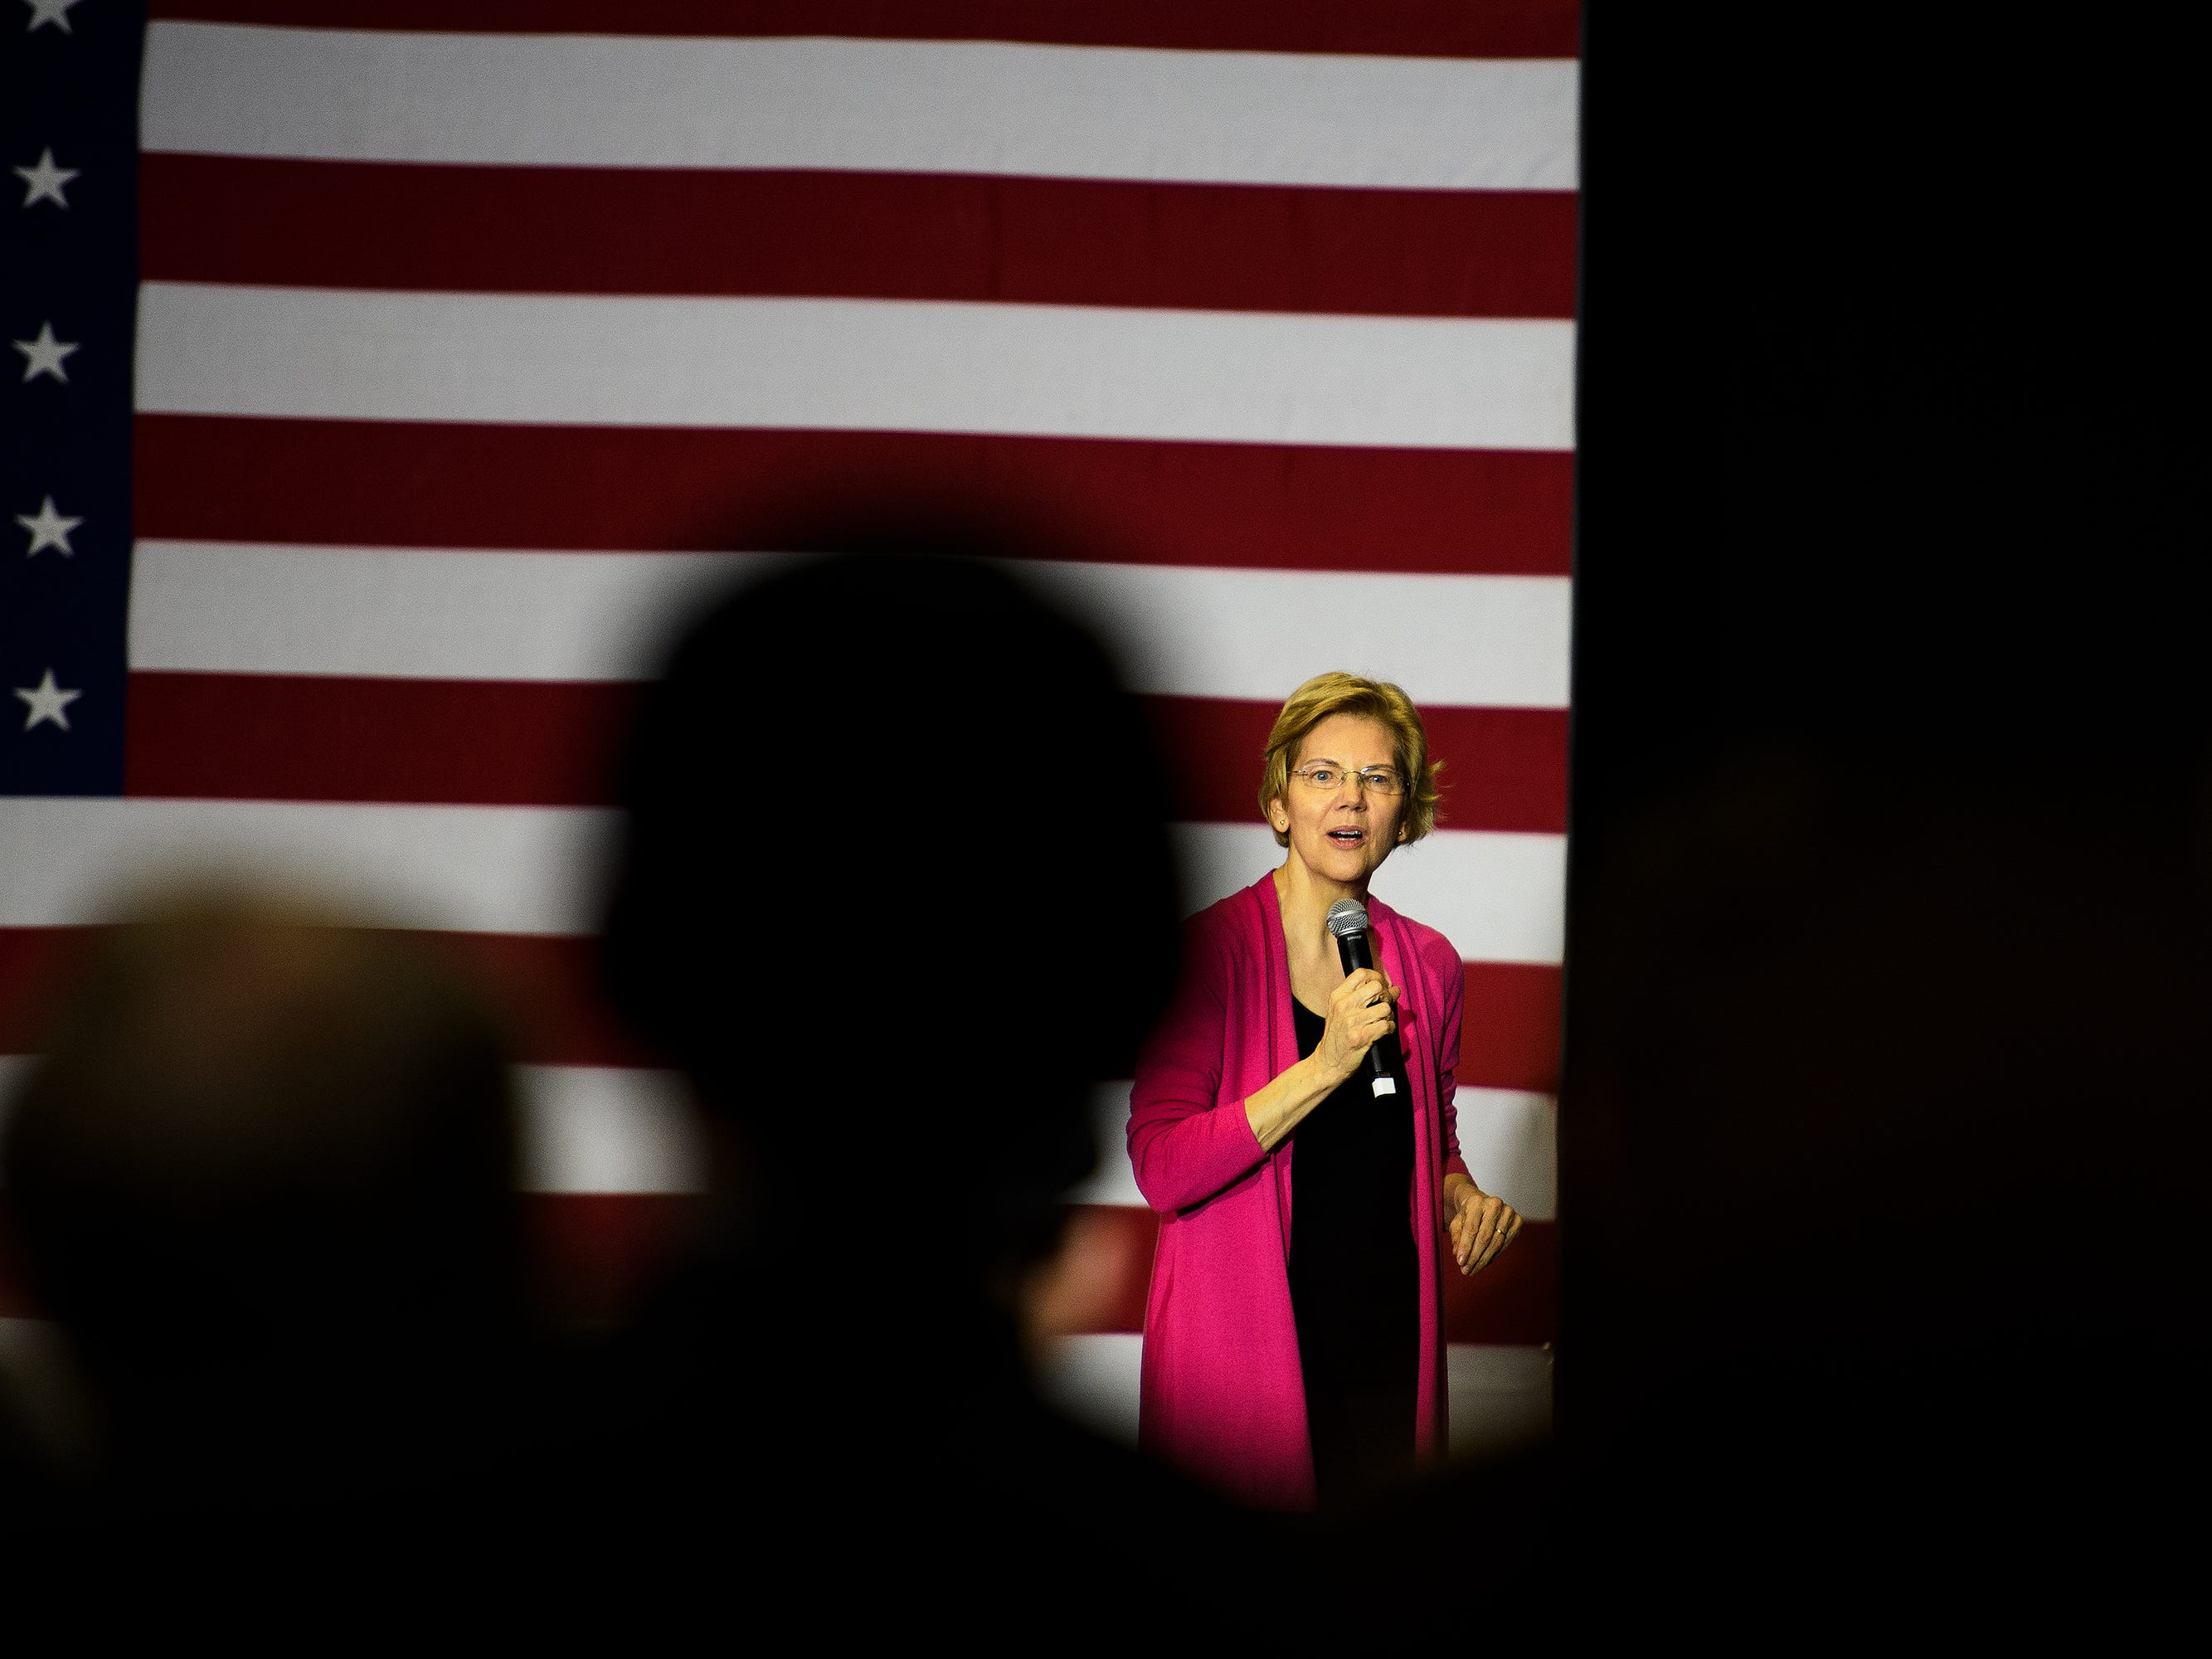 U.S. Sen. Elizabeth Warren speaks during a campaign event at the West End Community Development Center in Greenville Saturday, Feb. 16, 2019.